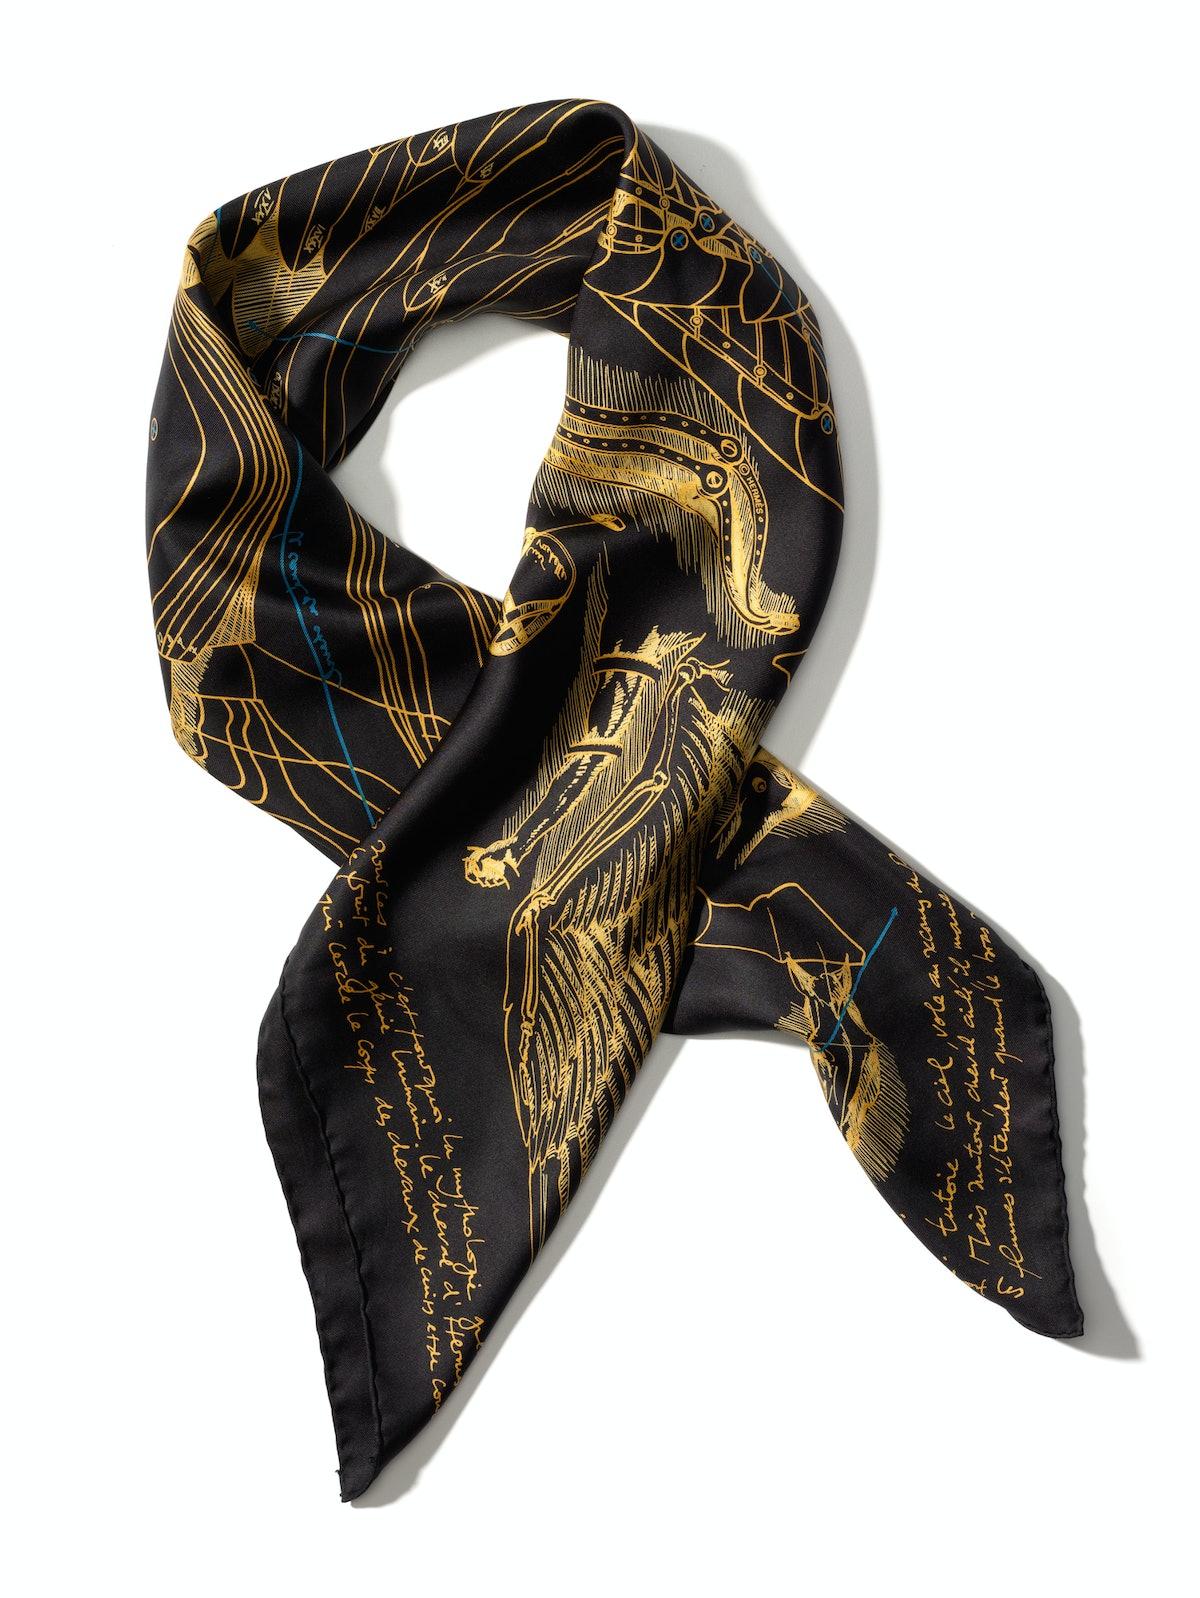 Hermès scarf, $410, hermes.com.